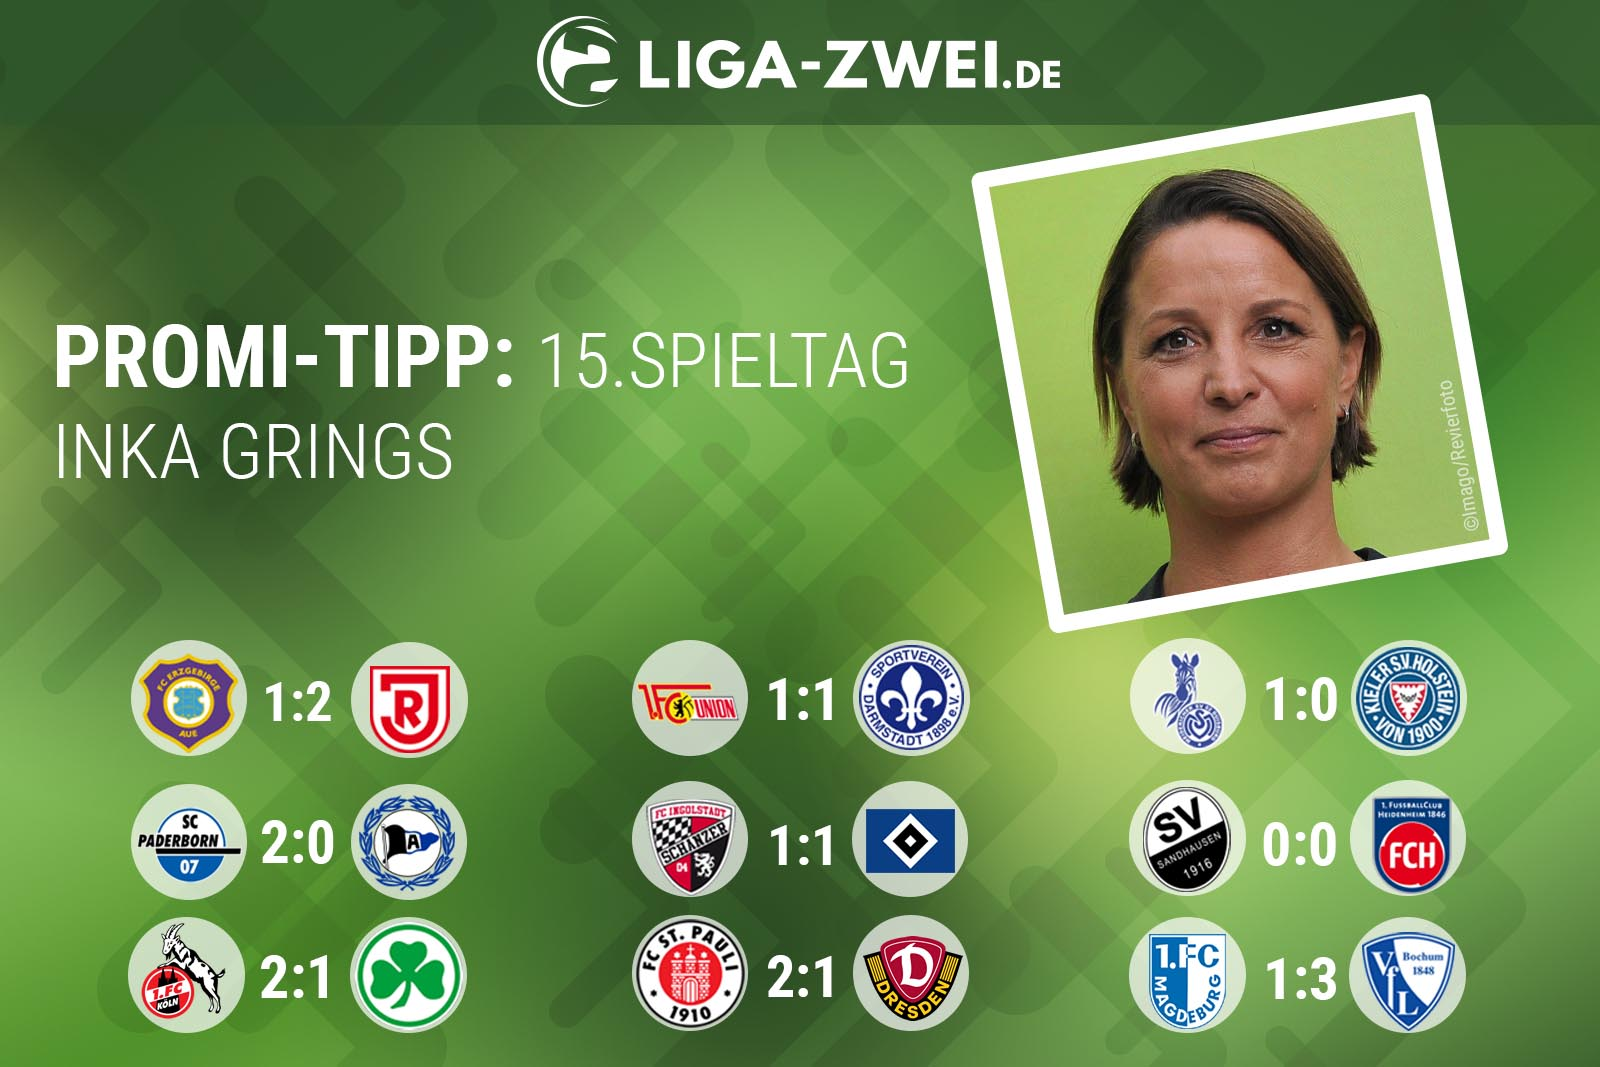 Inka Grings beim Liga-Zwei.de Promi-Tipp